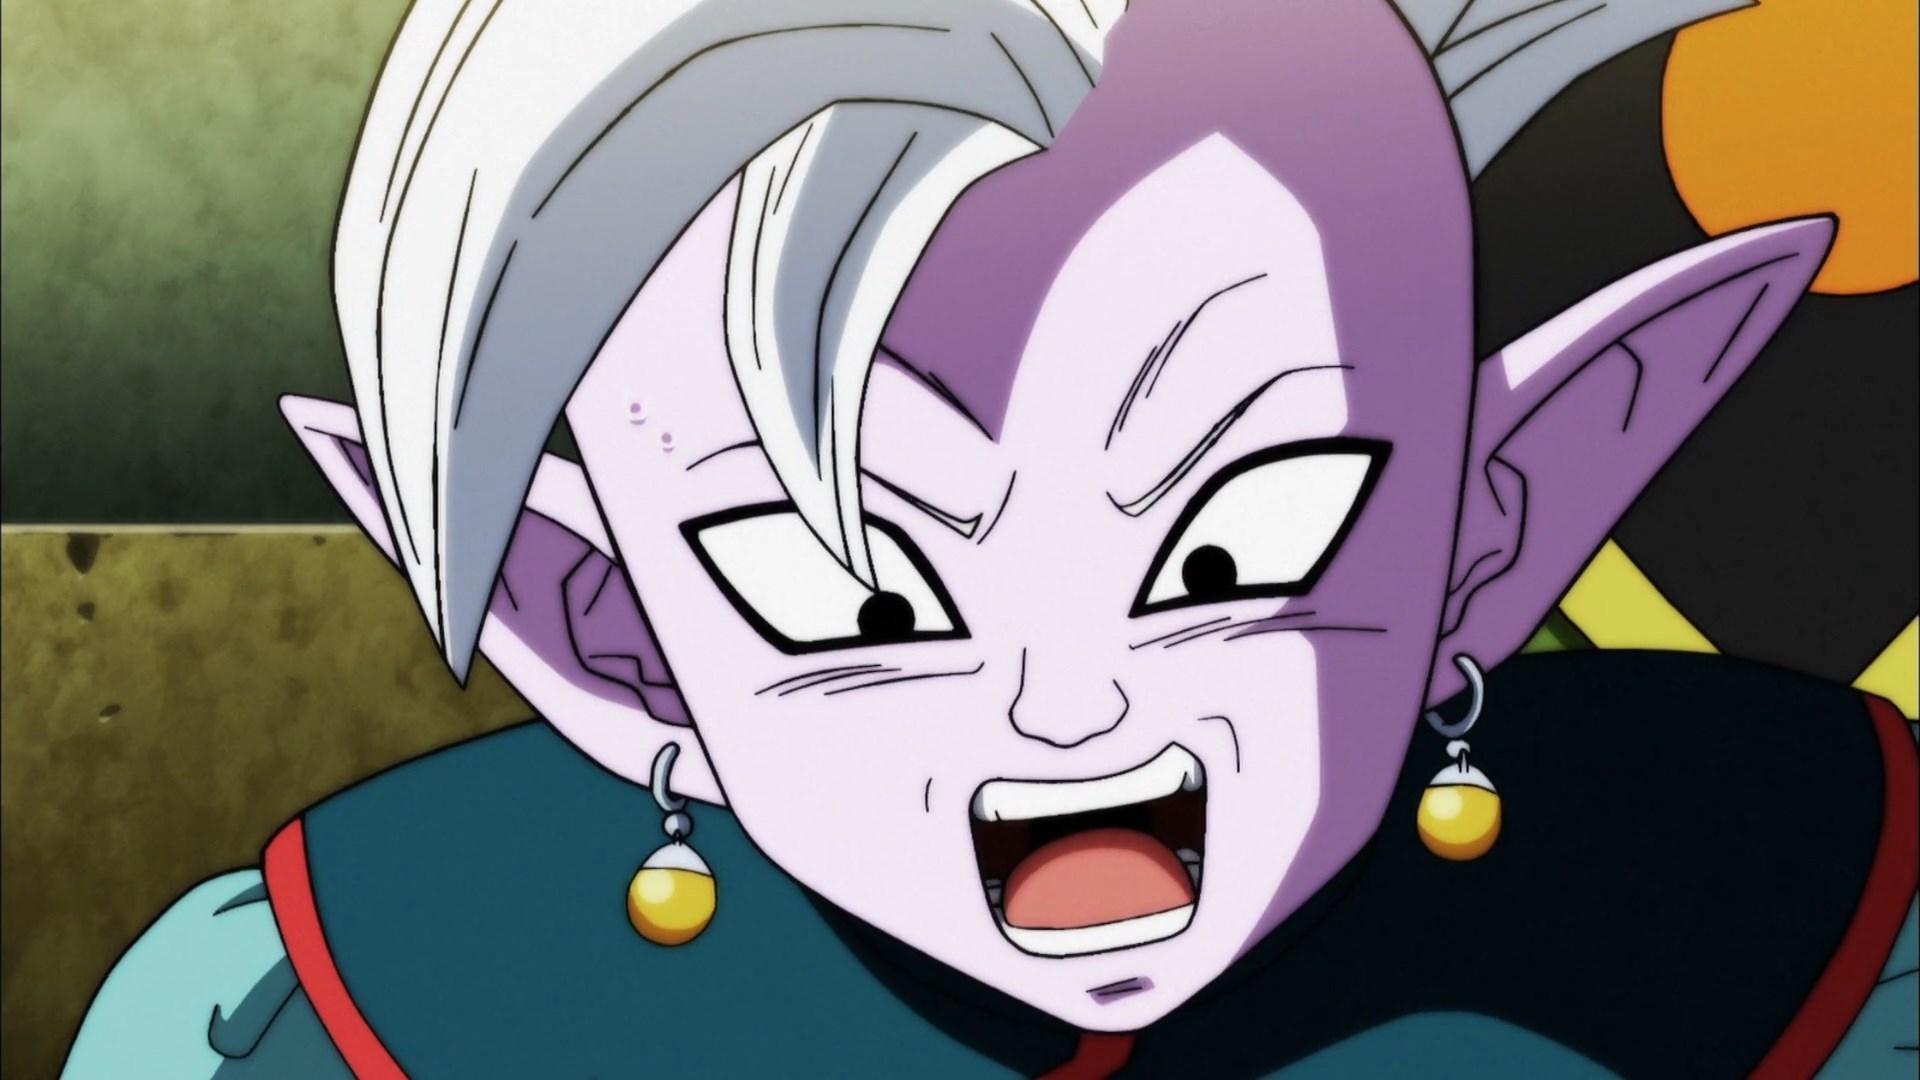 [HorribleSubs] Dragon Ball Super - 121 [1080p].mkv_snapshot_09.40